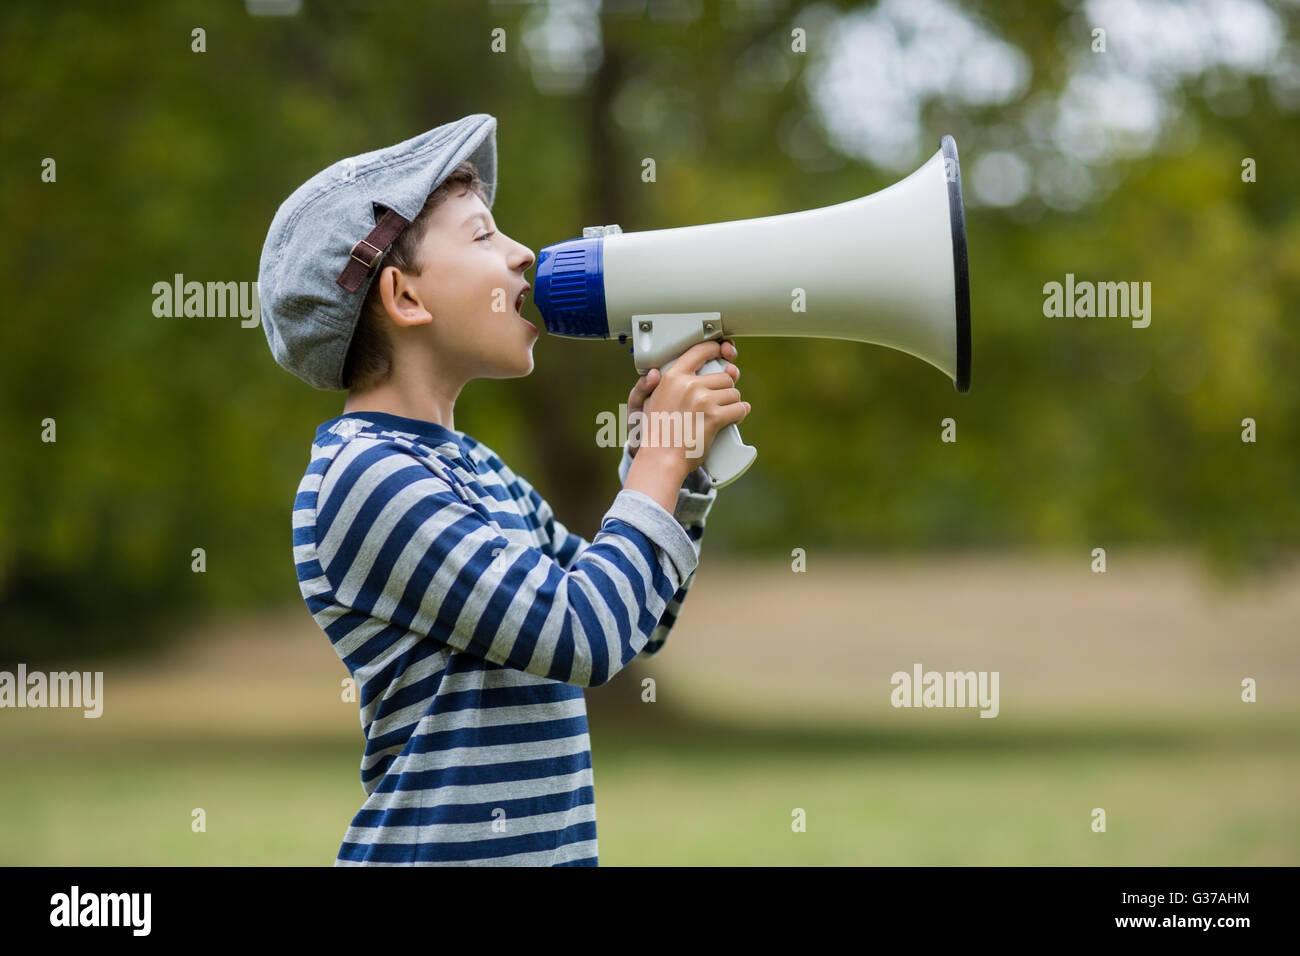 Boy speaking on megaphone - Stock Image